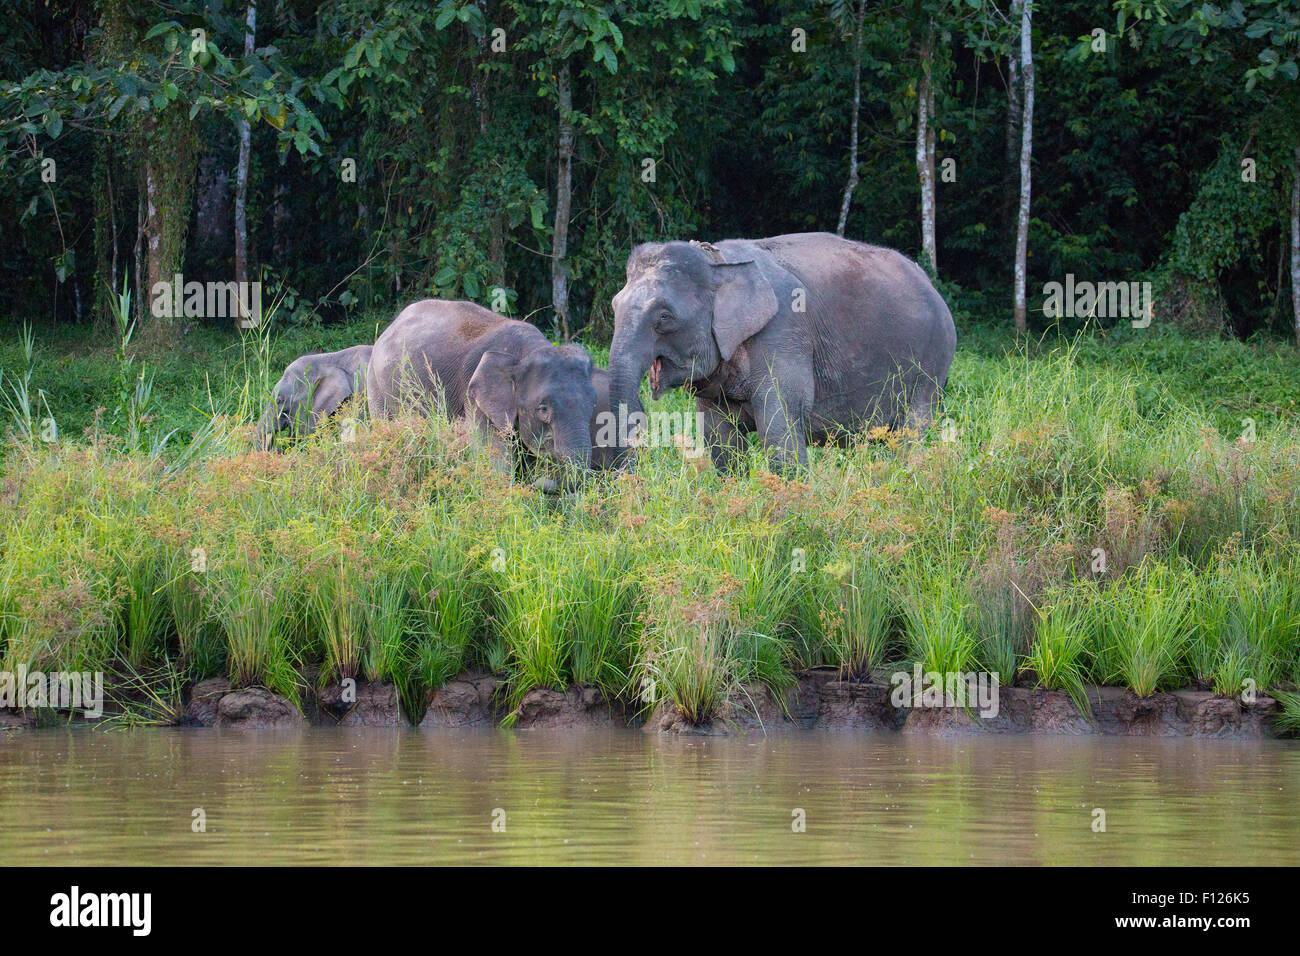 L'éléphant pygmée de Bornéo (Elephas maximus borneensis), la rivière Kinabatangan, Photo Stock